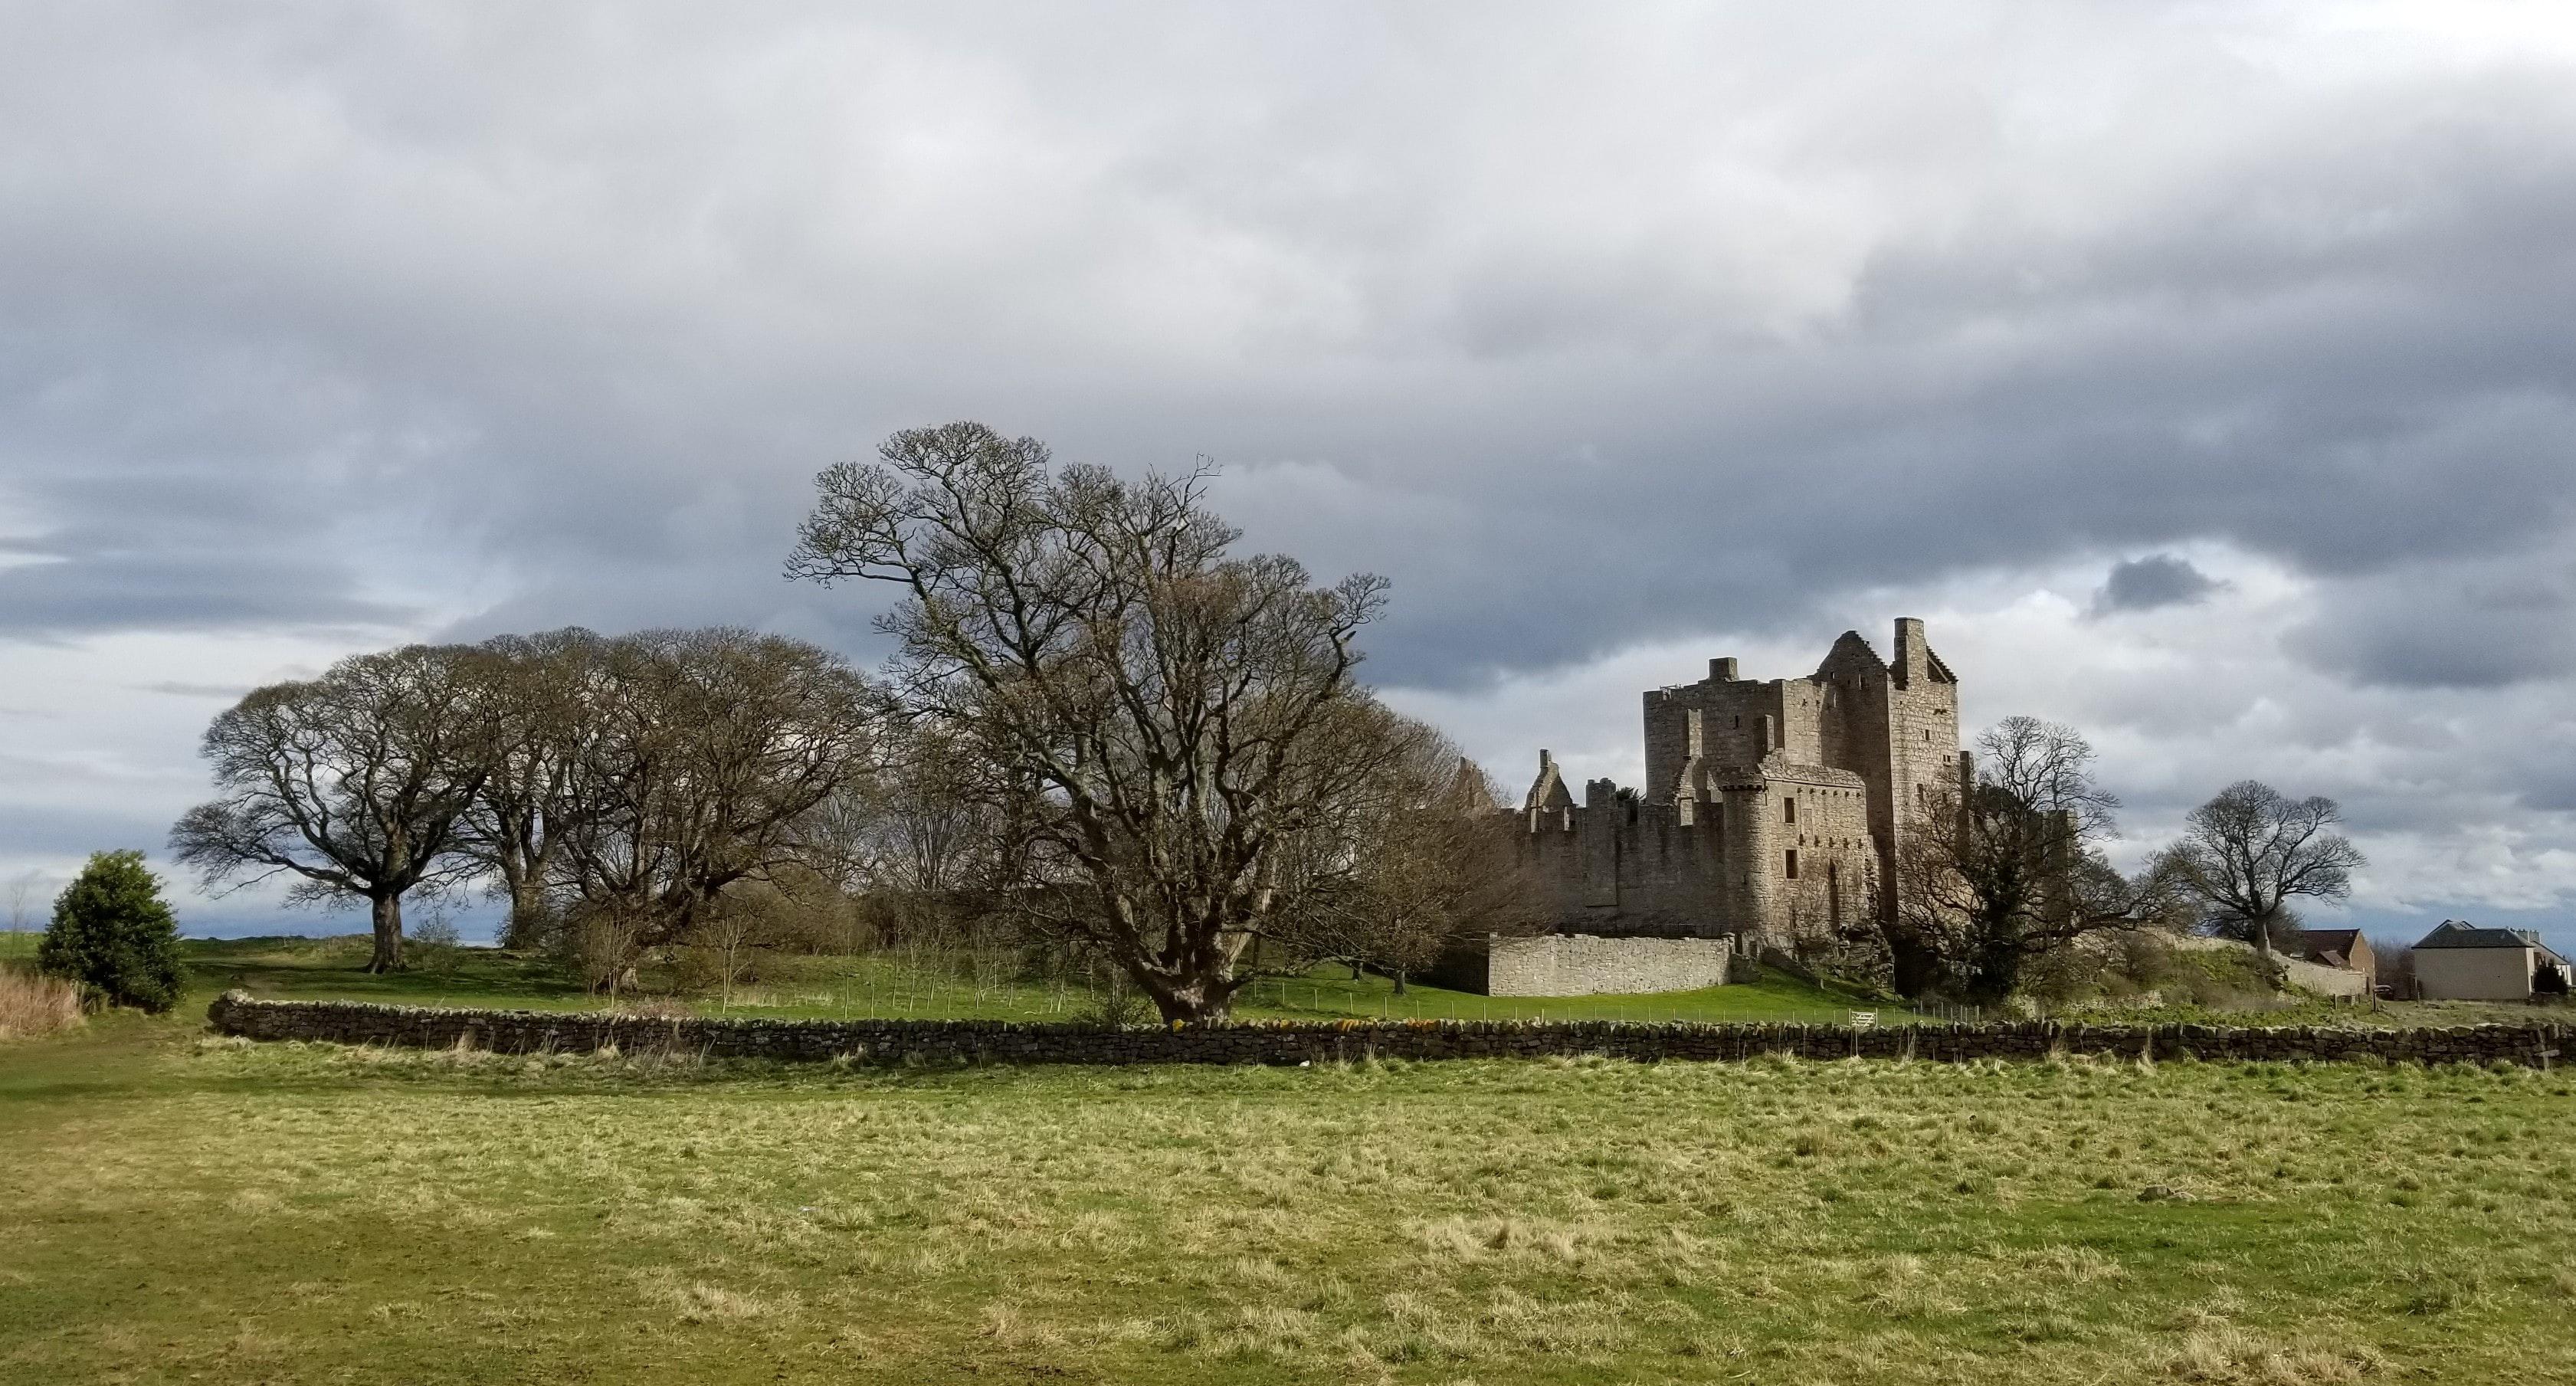 craigmillar castle in edinburgh to see on bike